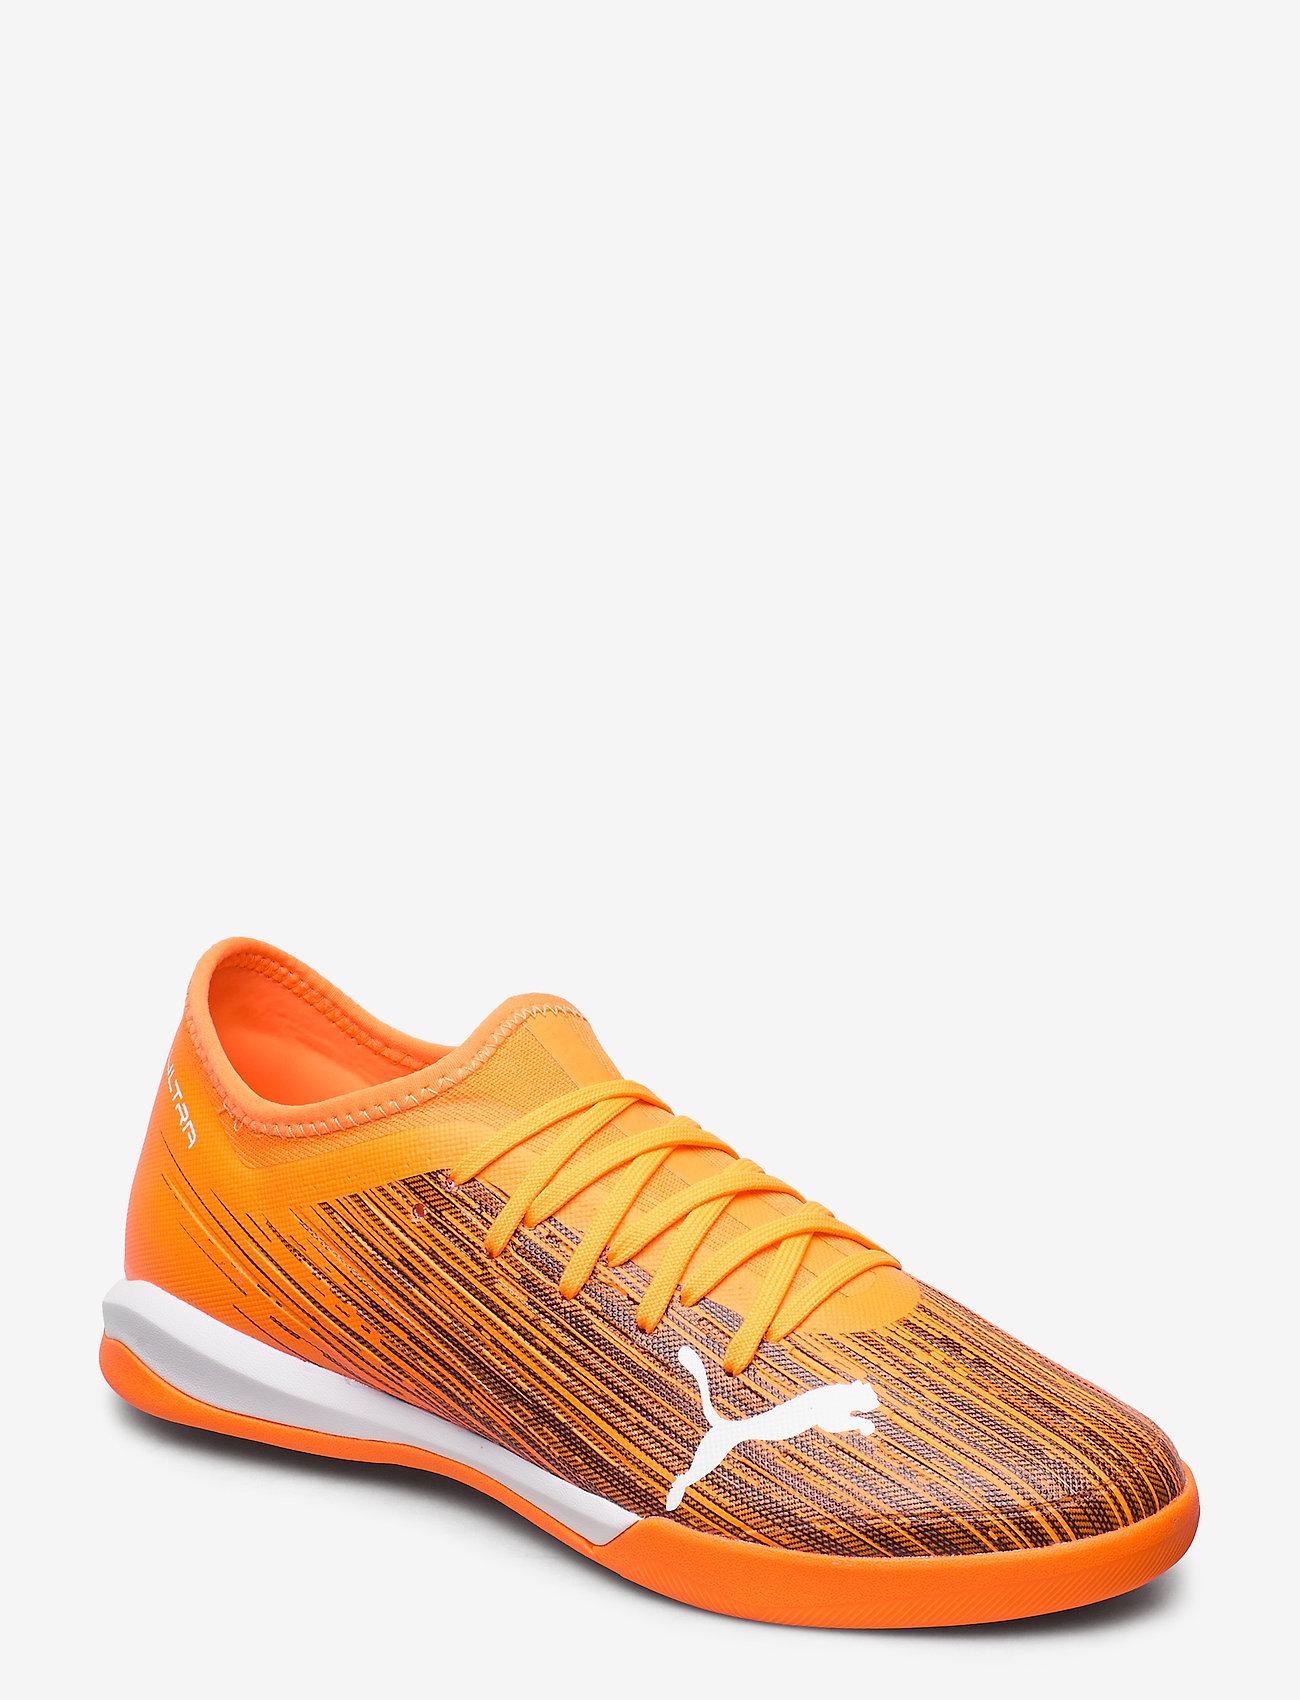 PUMA - ULTRA 3.1 IT - fodboldsko - shocking orange-puma black - 0